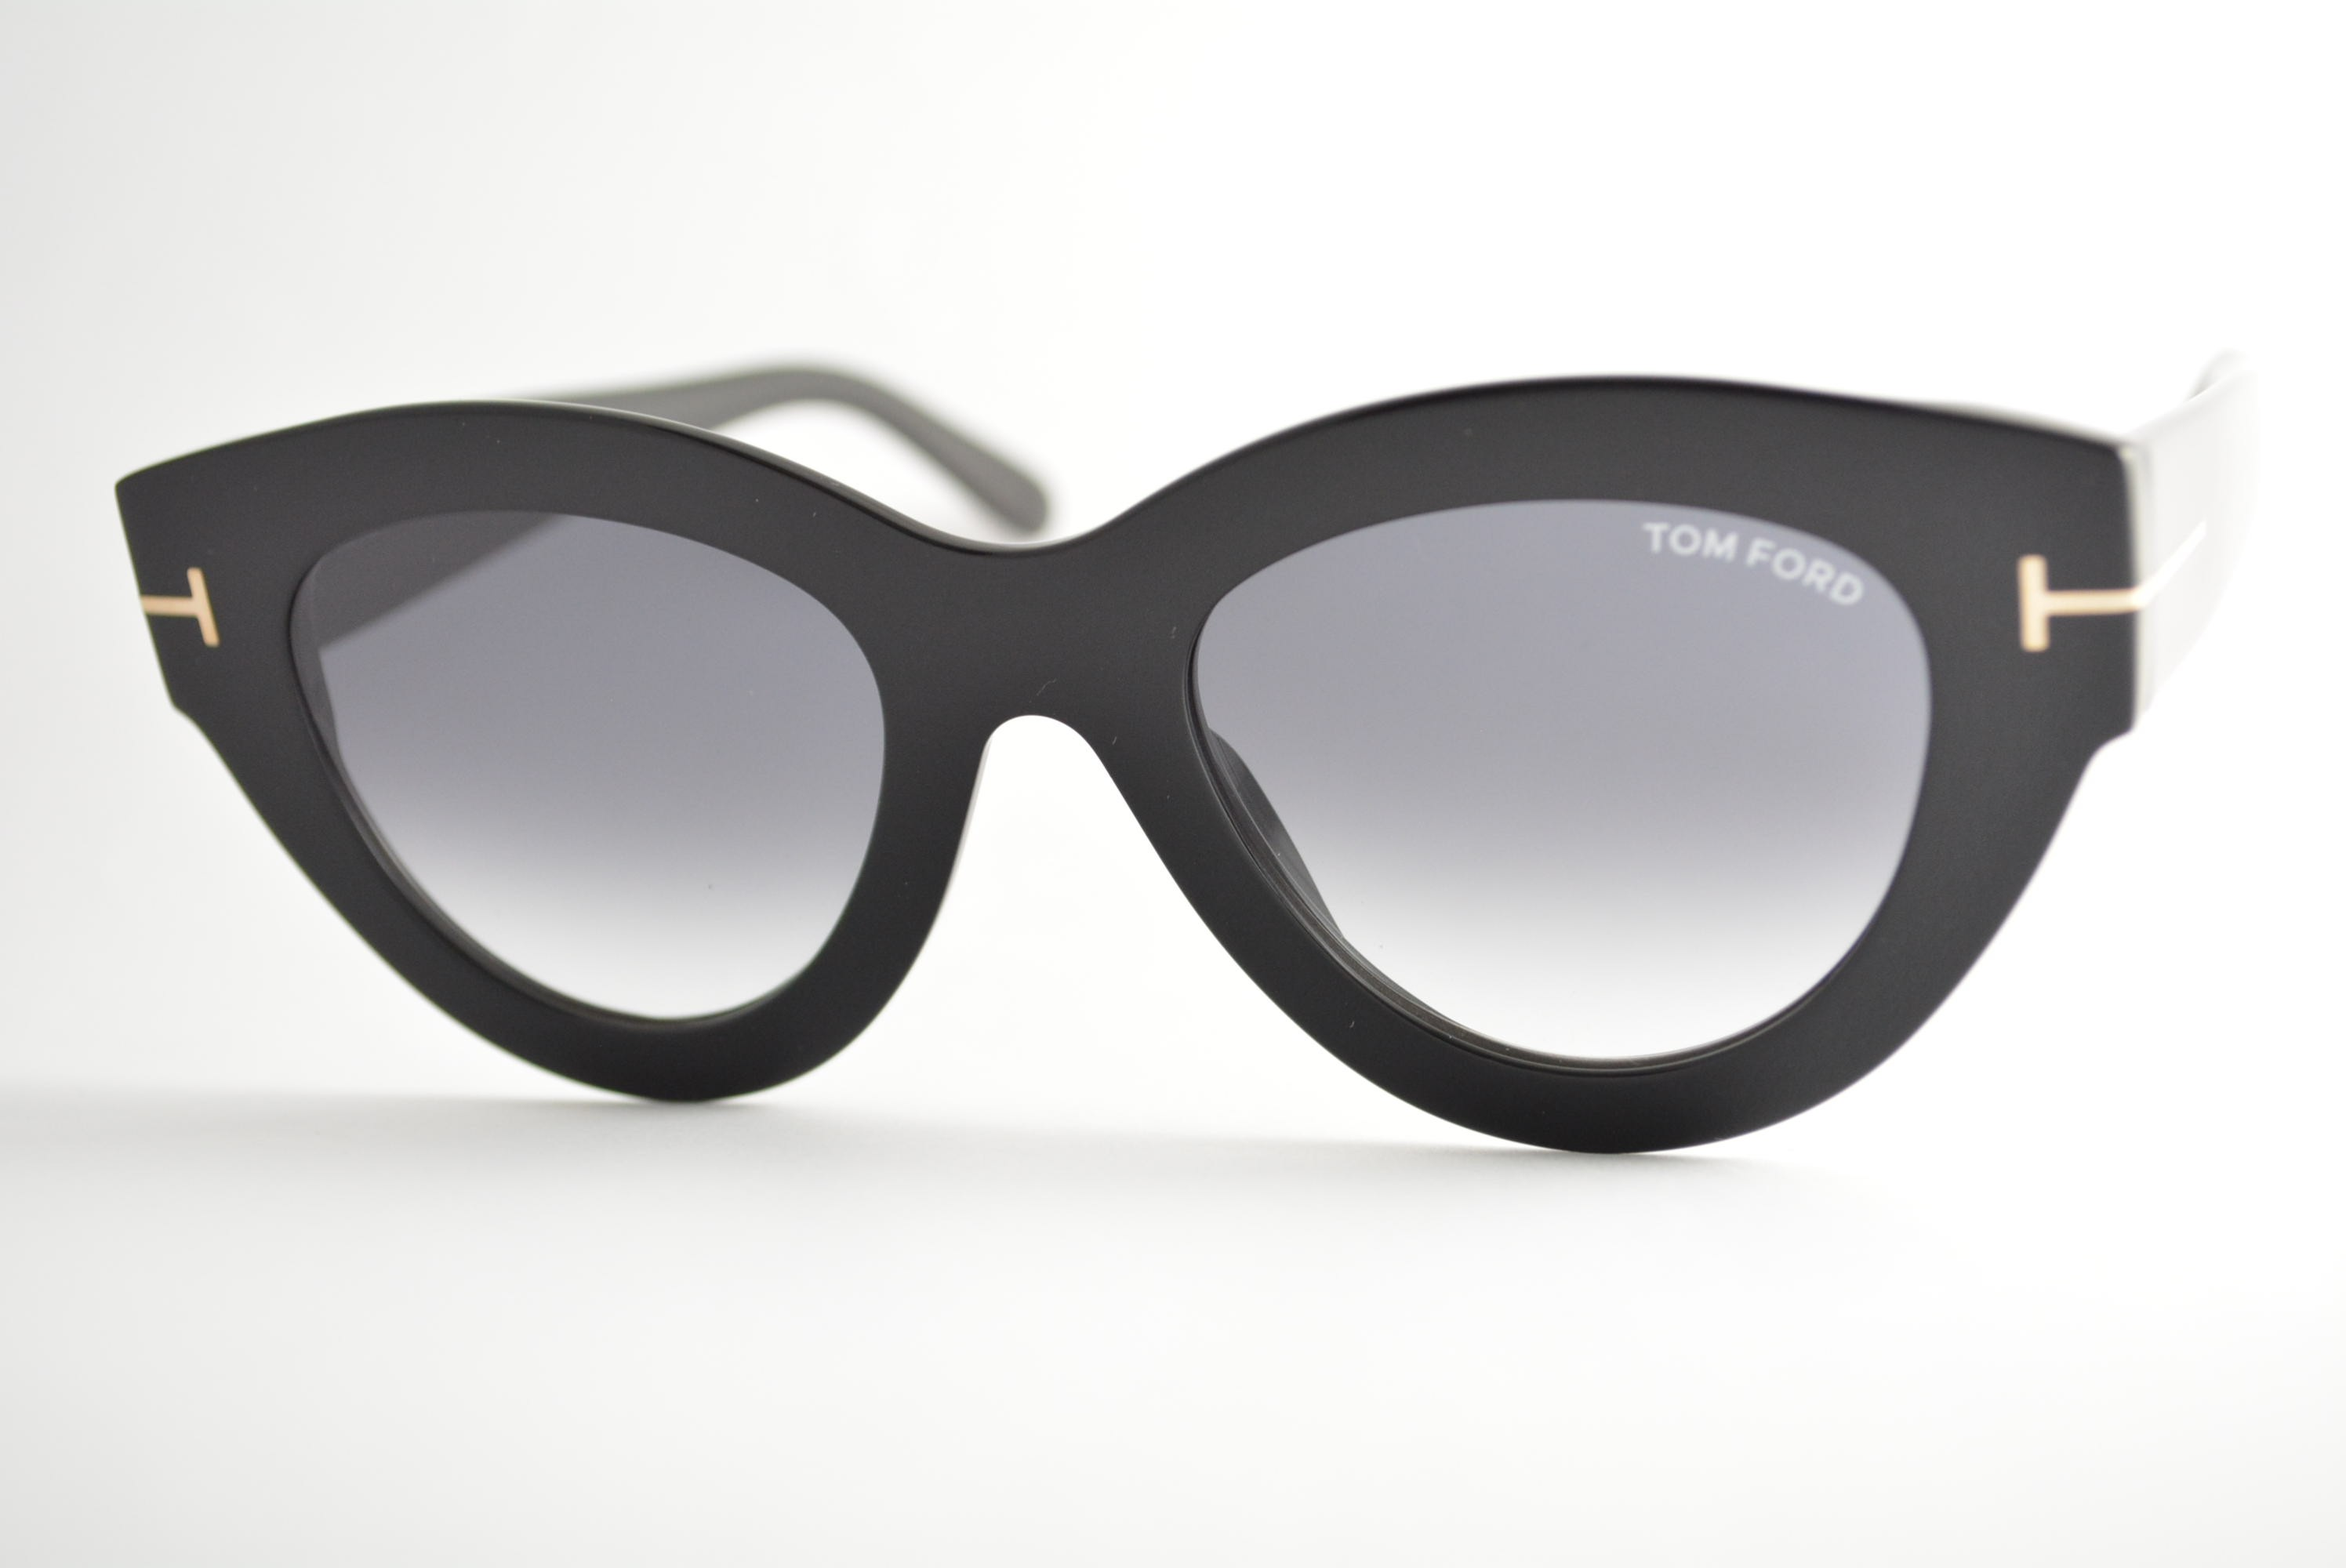 óculos de sol Tom Ford mod Slater tf658 01b